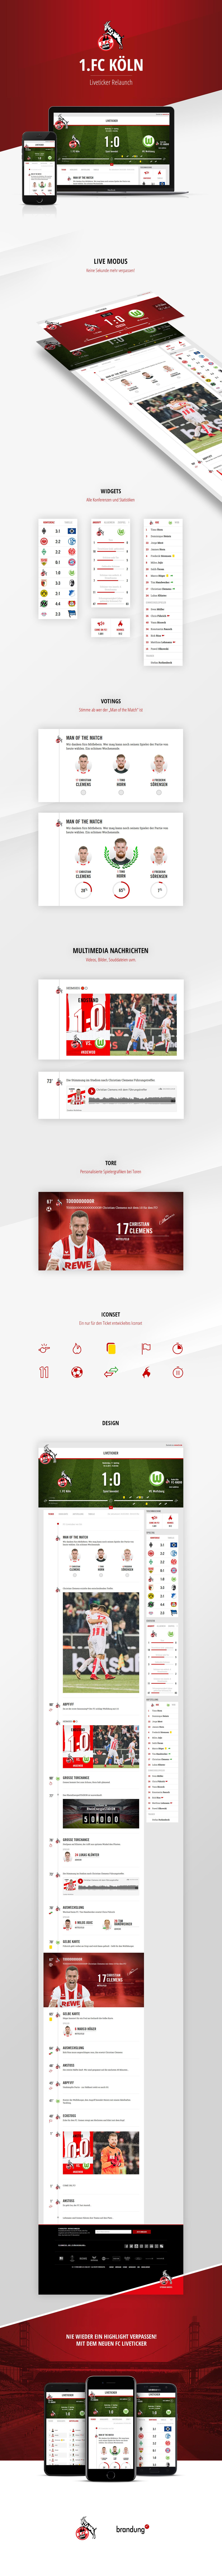 FC köln cologne liveticker Web design Fussball soccer sports club